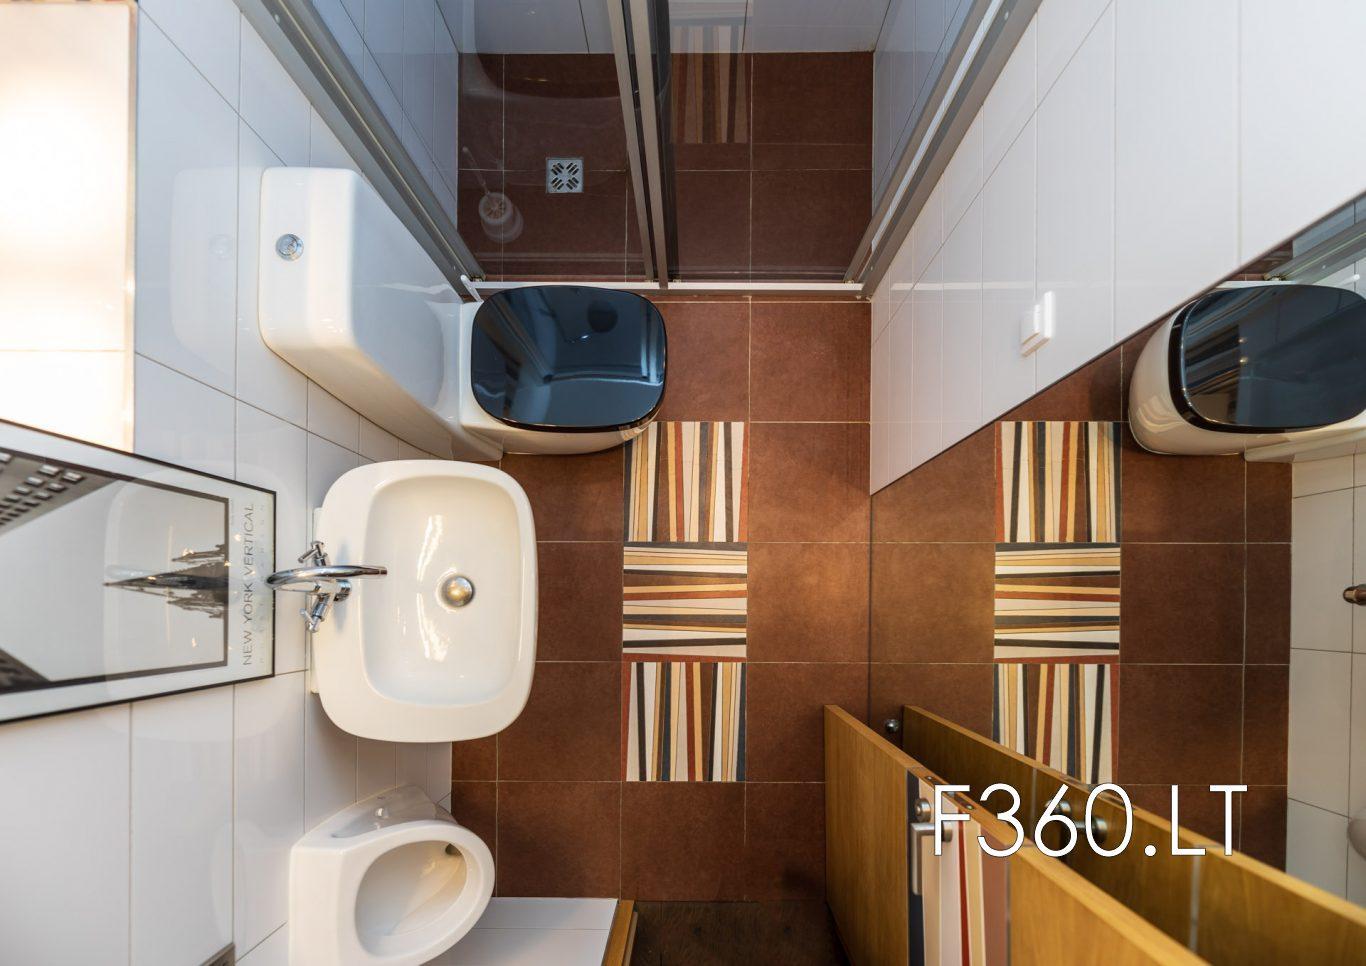 Nt824 Apartmentai. Klaipeda Apartamentu Foto Paslaugos F360 Lt 3t4a7044 Edit